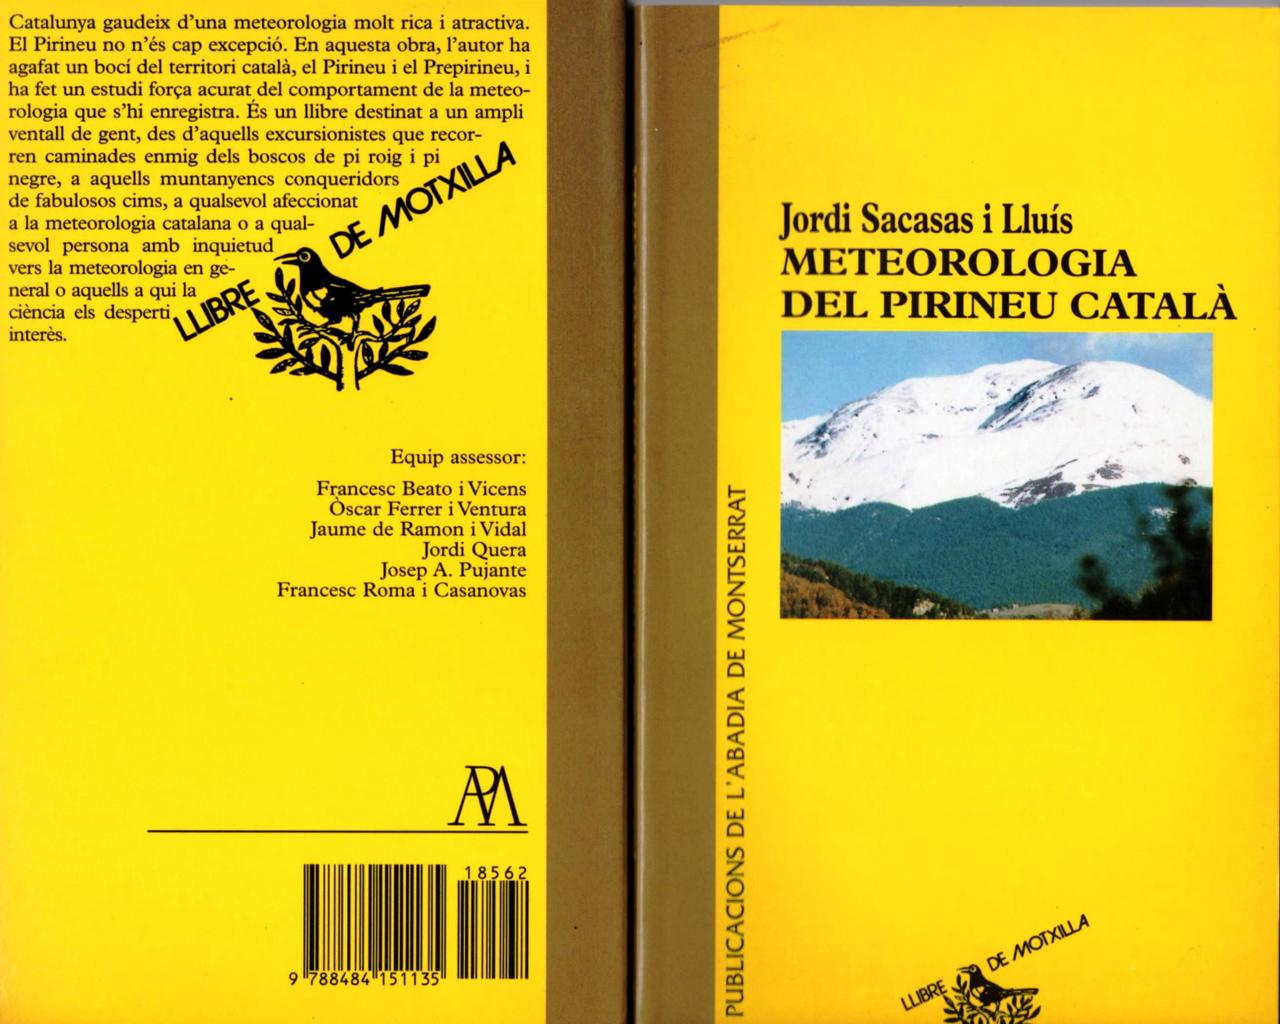 Meteoteca de Catalunya - Meteorologia del Pirineu Català